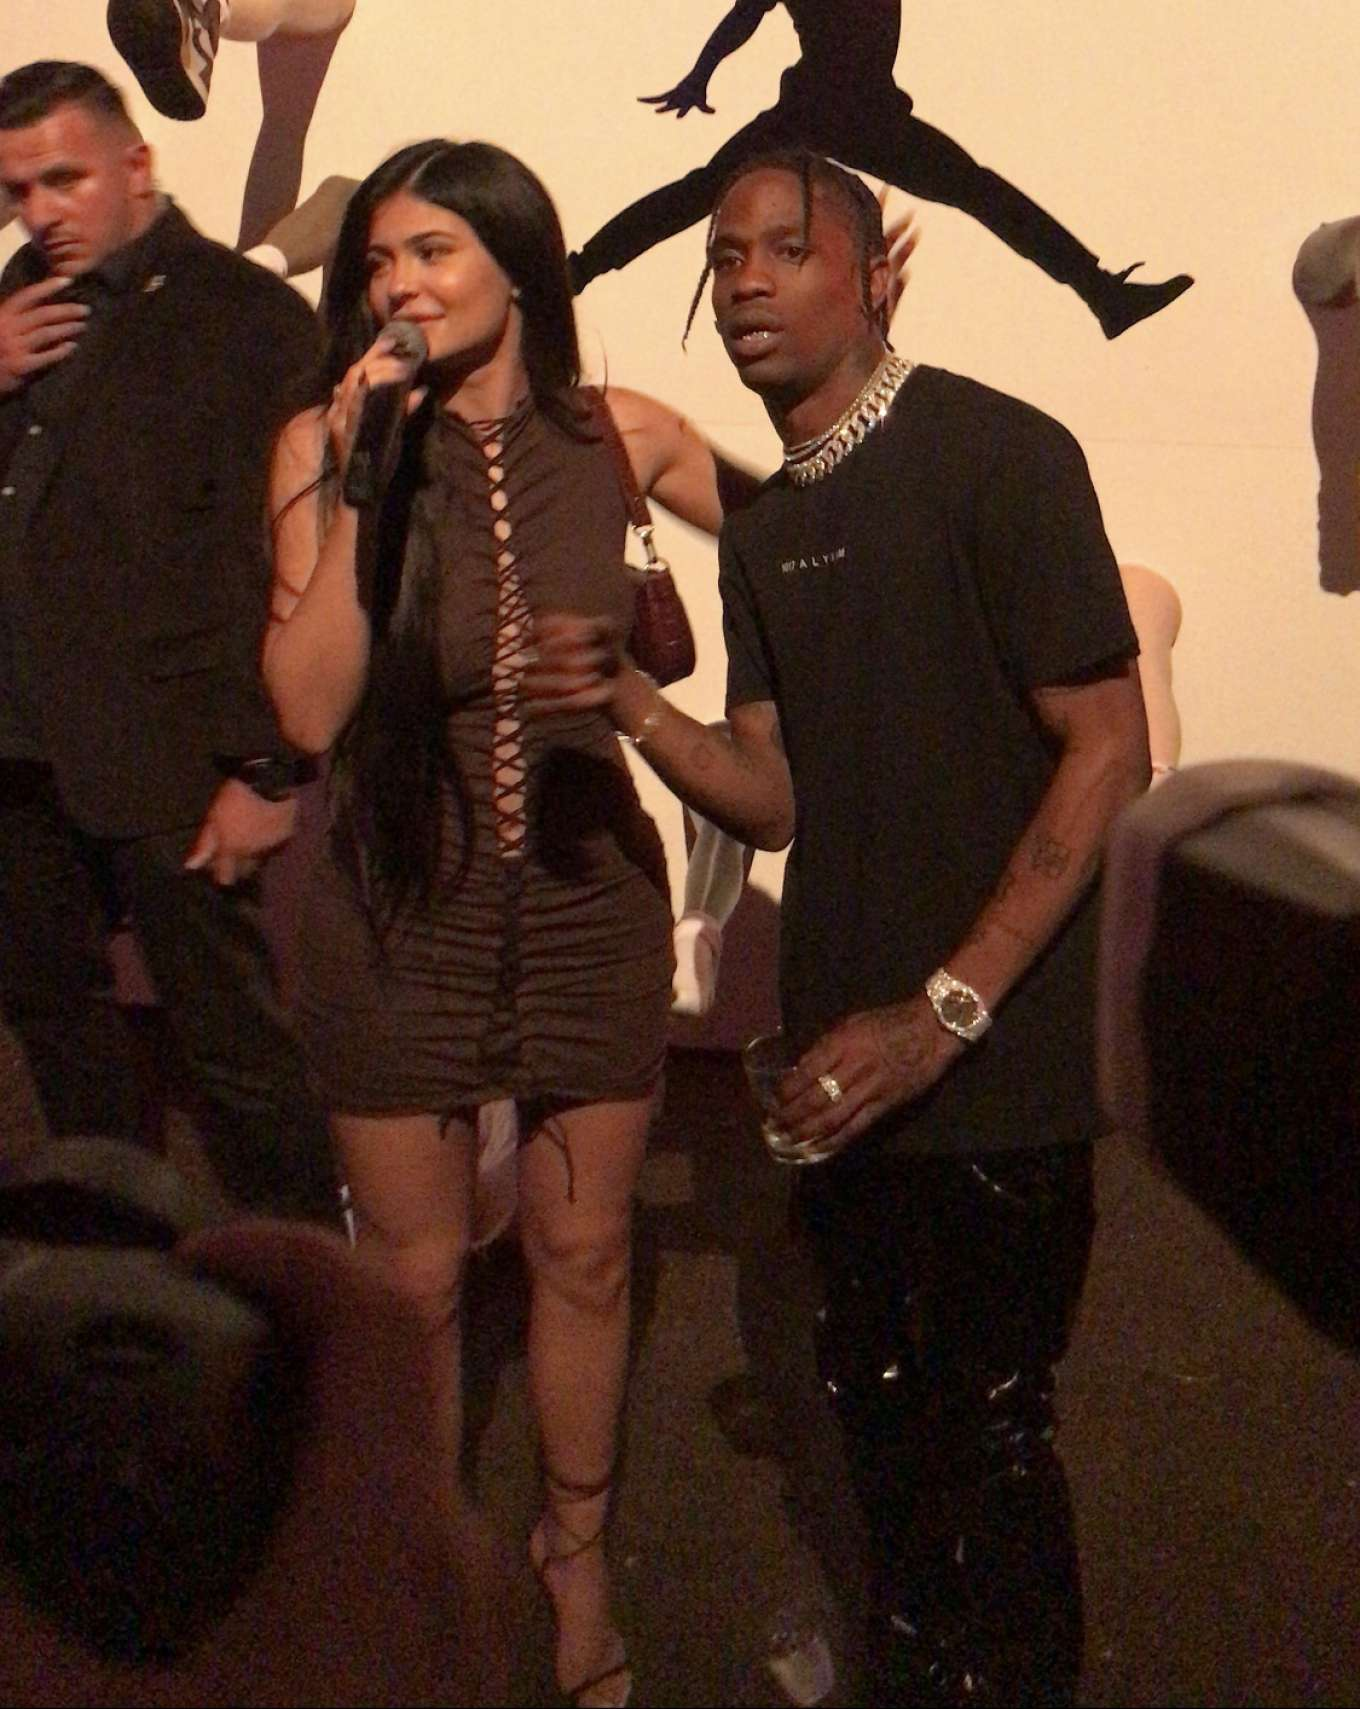 Kylie Jenner - Celebrates Travis Scott's birthday in Los Angeles